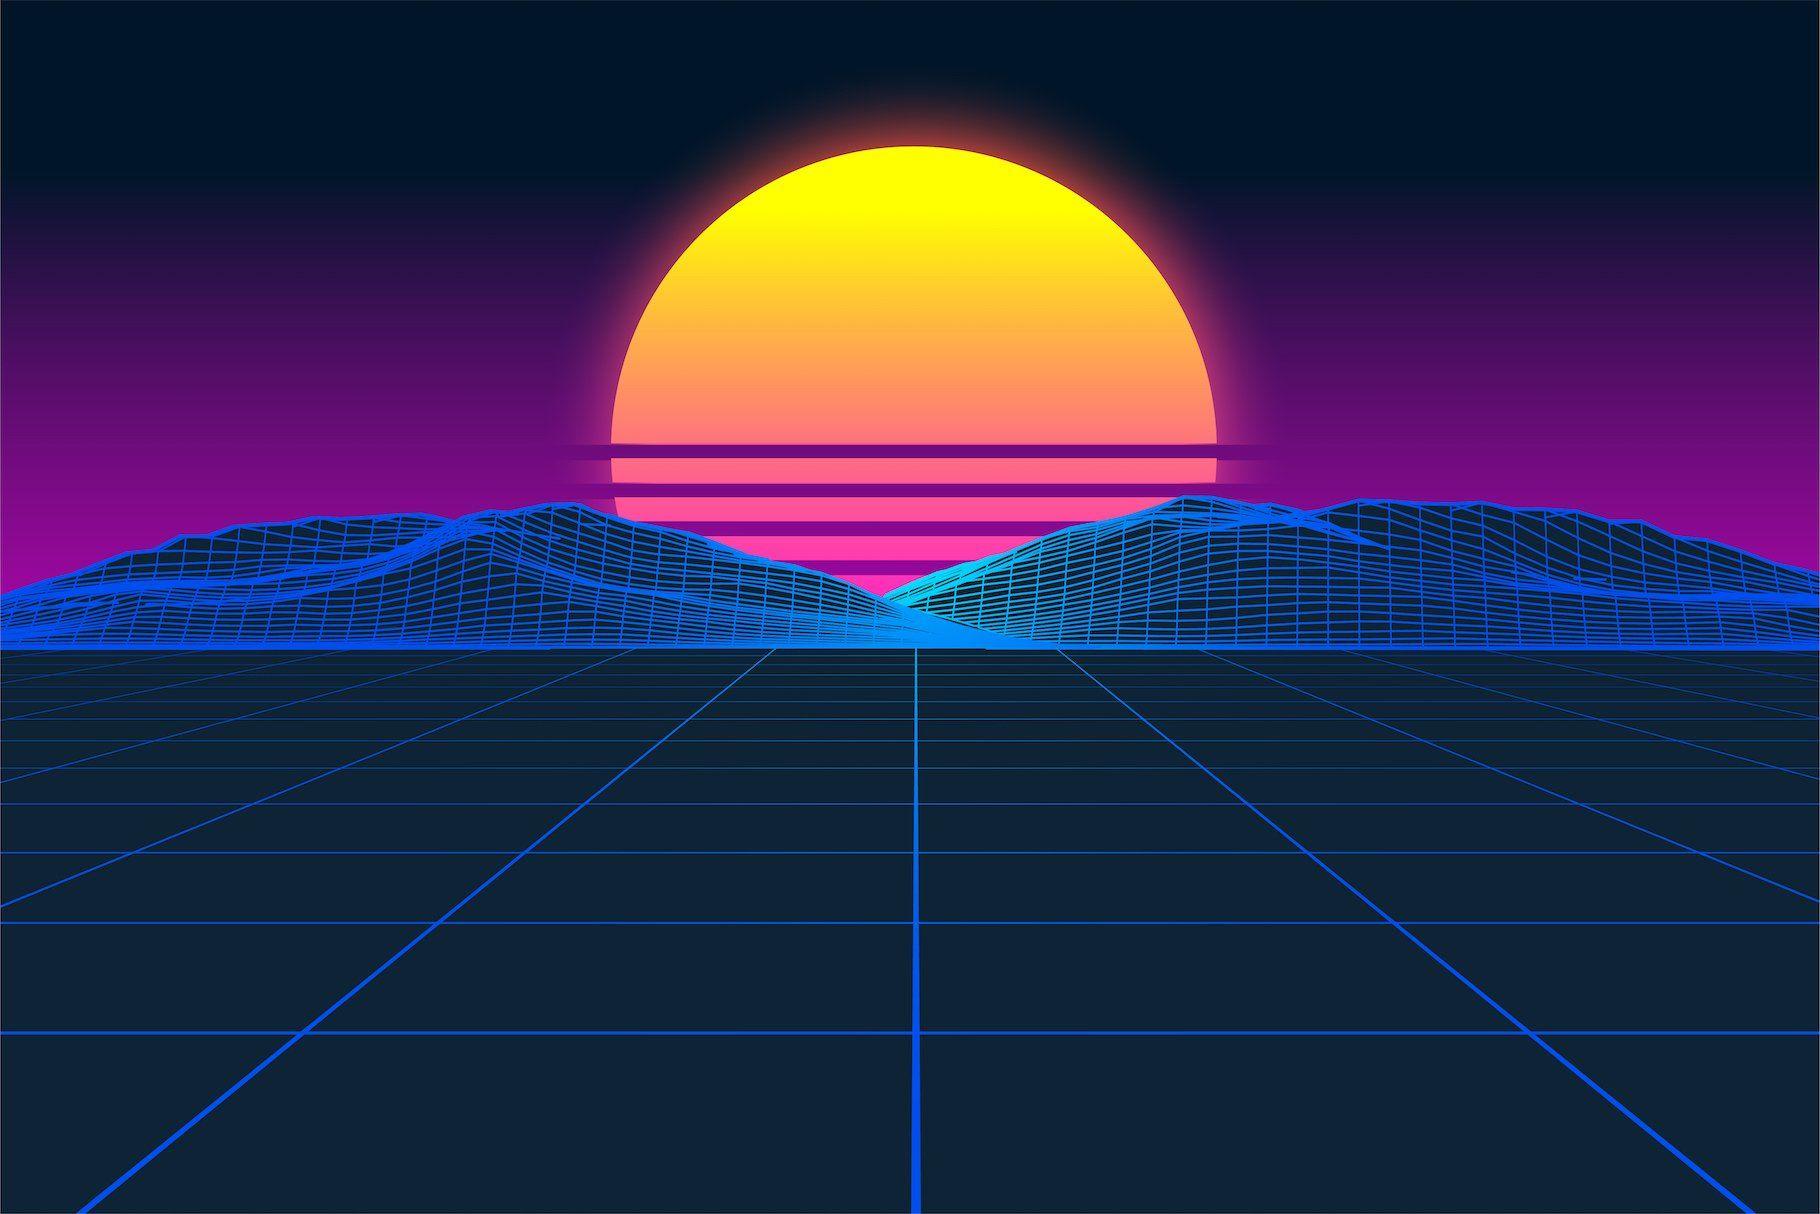 Retrofuturism Otf Vaporwave Font Vaporwave Vaporwave Music Photoshop Wallpapers